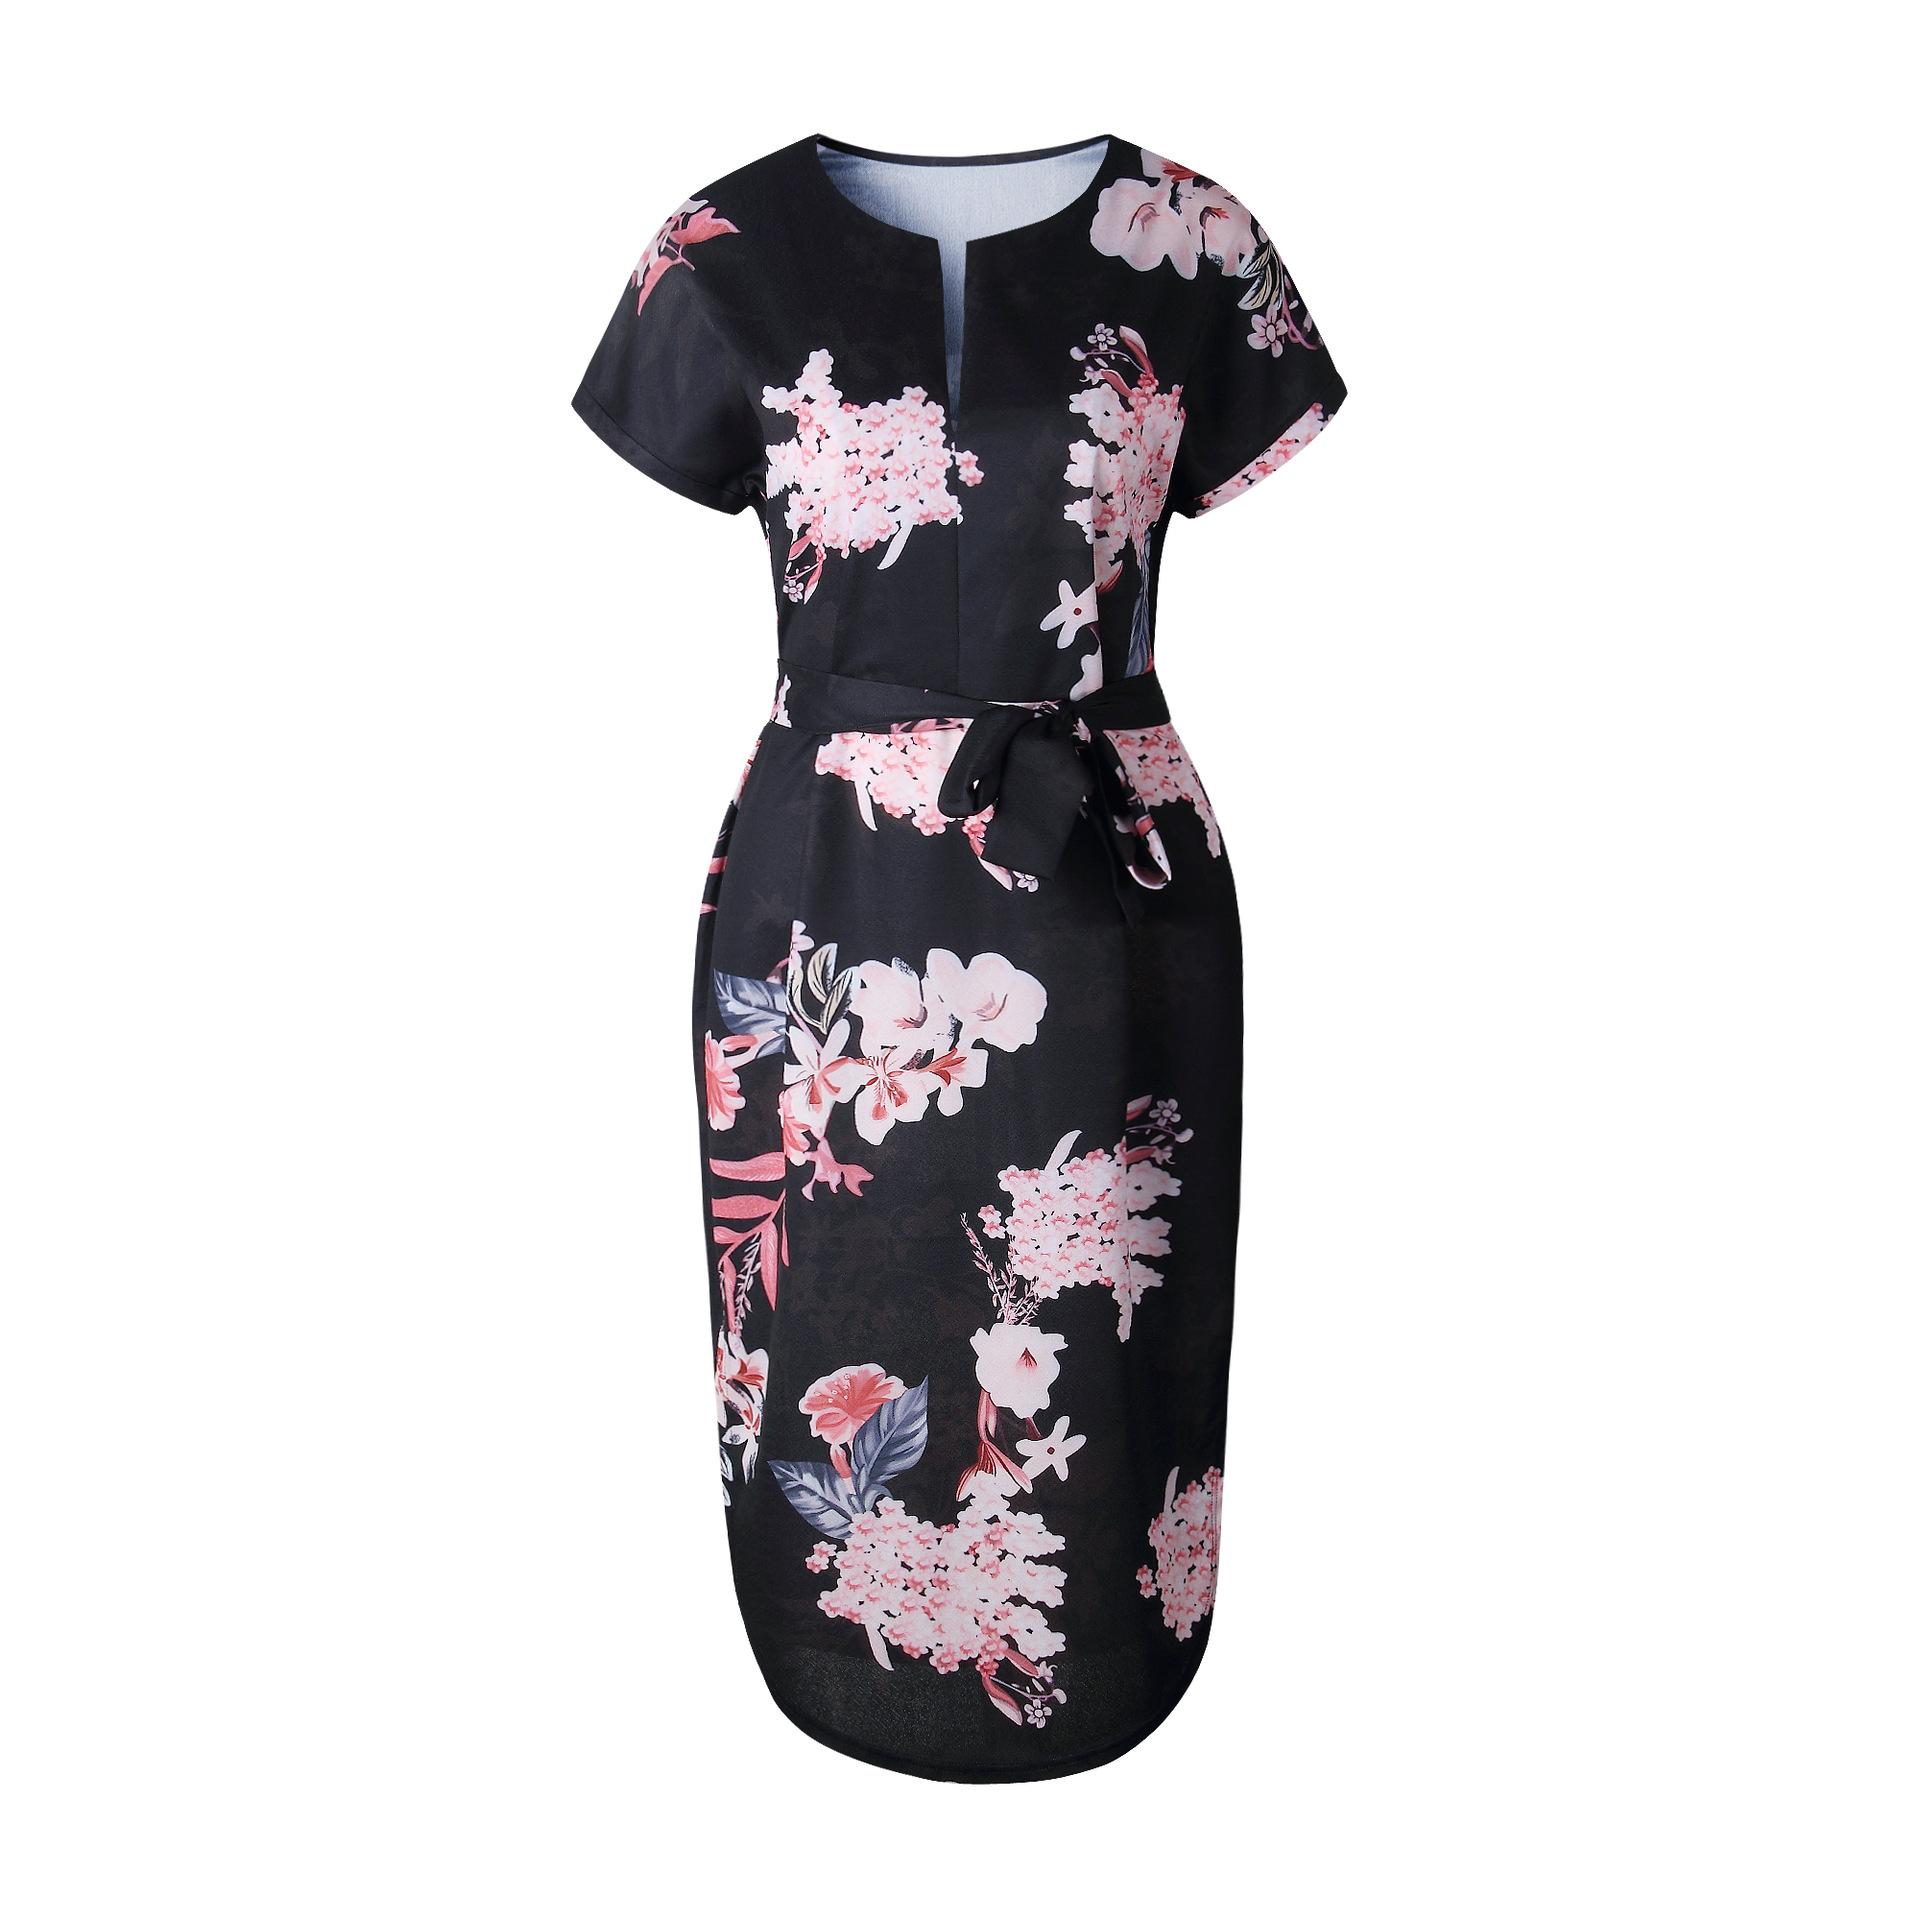 2018 Summer Dress Women Print V Neck Short Sleeve Robe Female Dresses Casual Sashes Midi Dress Ladies Elegant Vestidos Dropship 23